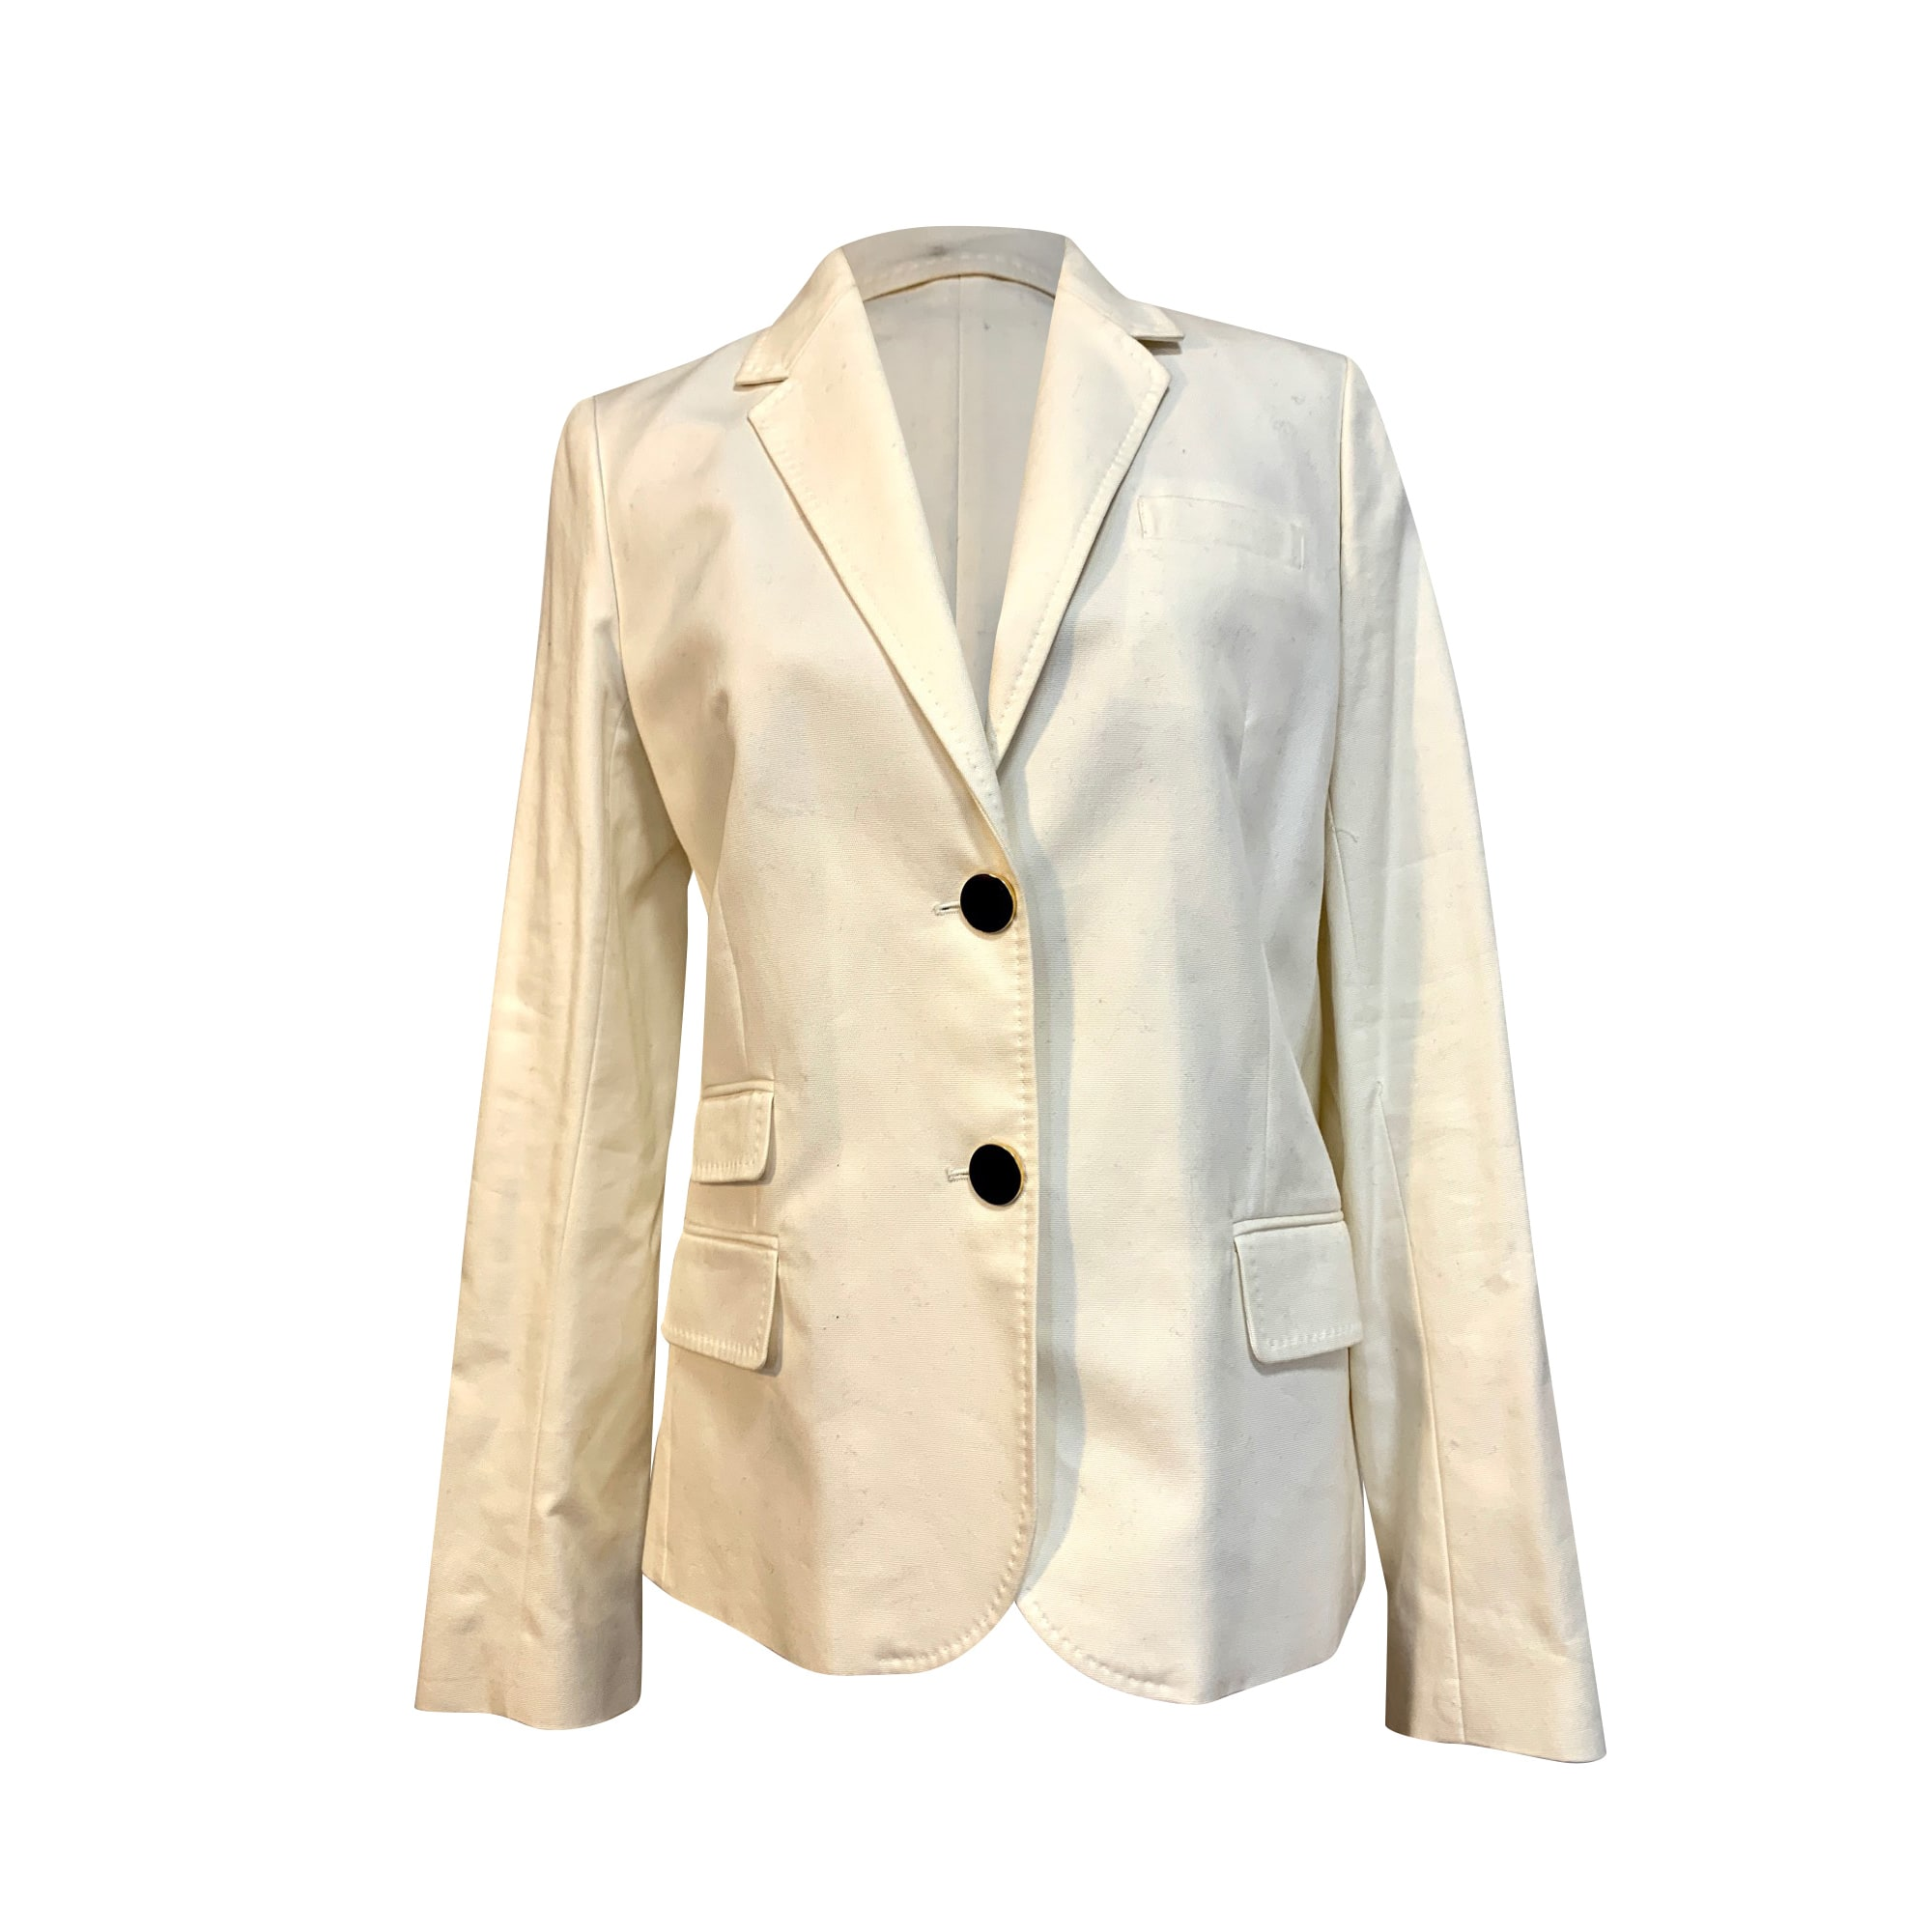 Blazer, veste tailleur VANESSA BRUNO Blanc, blanc cassé, écru